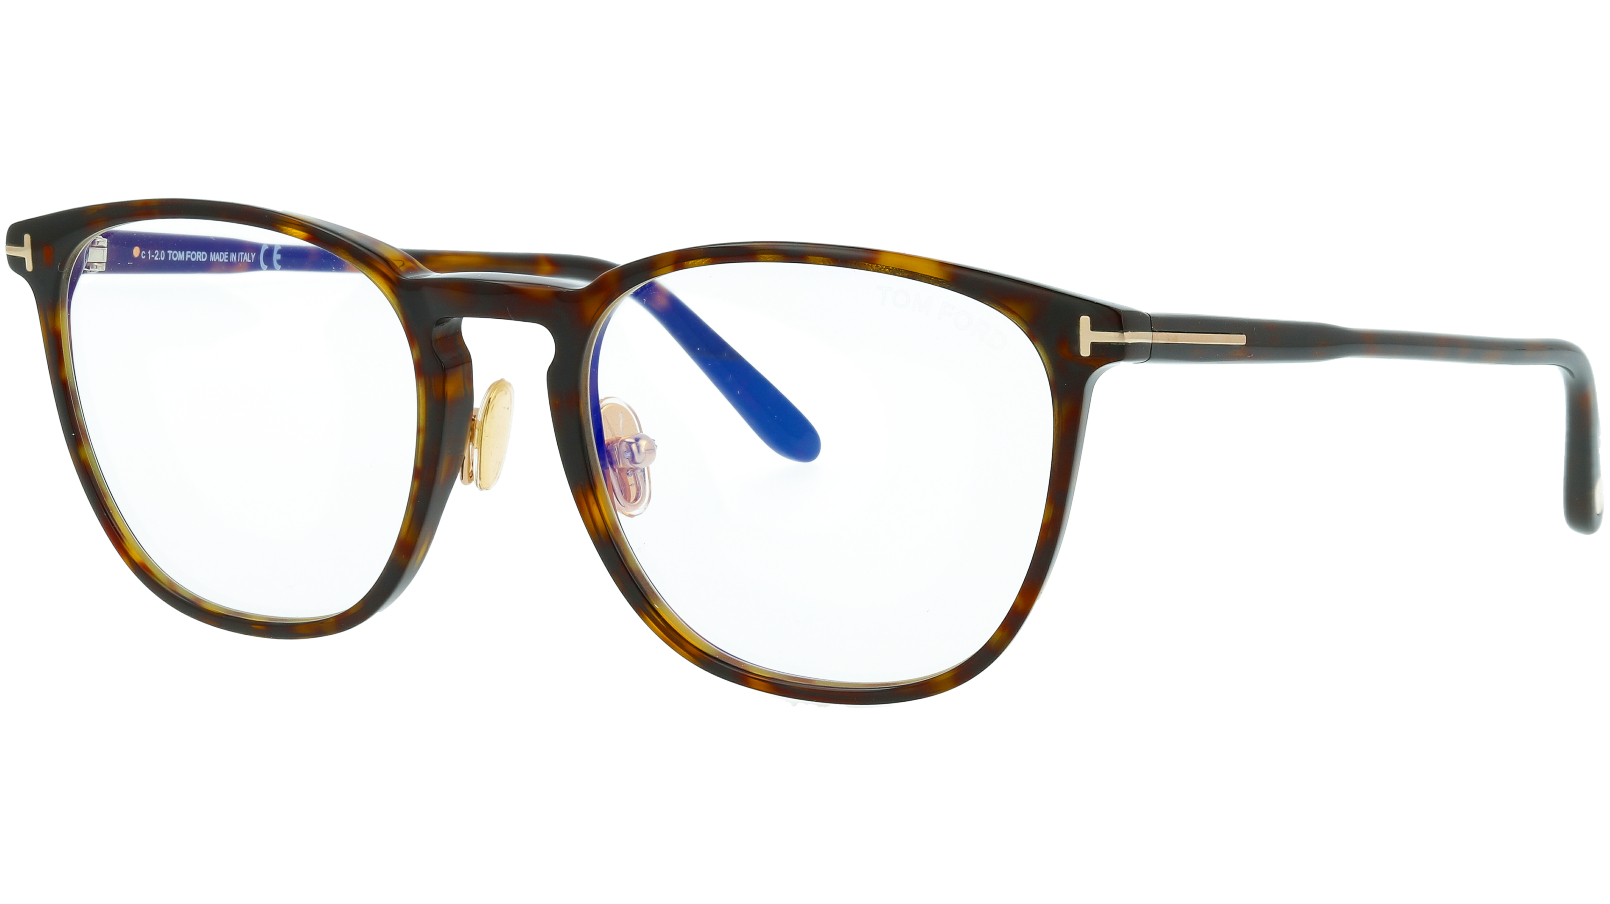 Tom Ford TF5700-B 052 54 Dark Glasses